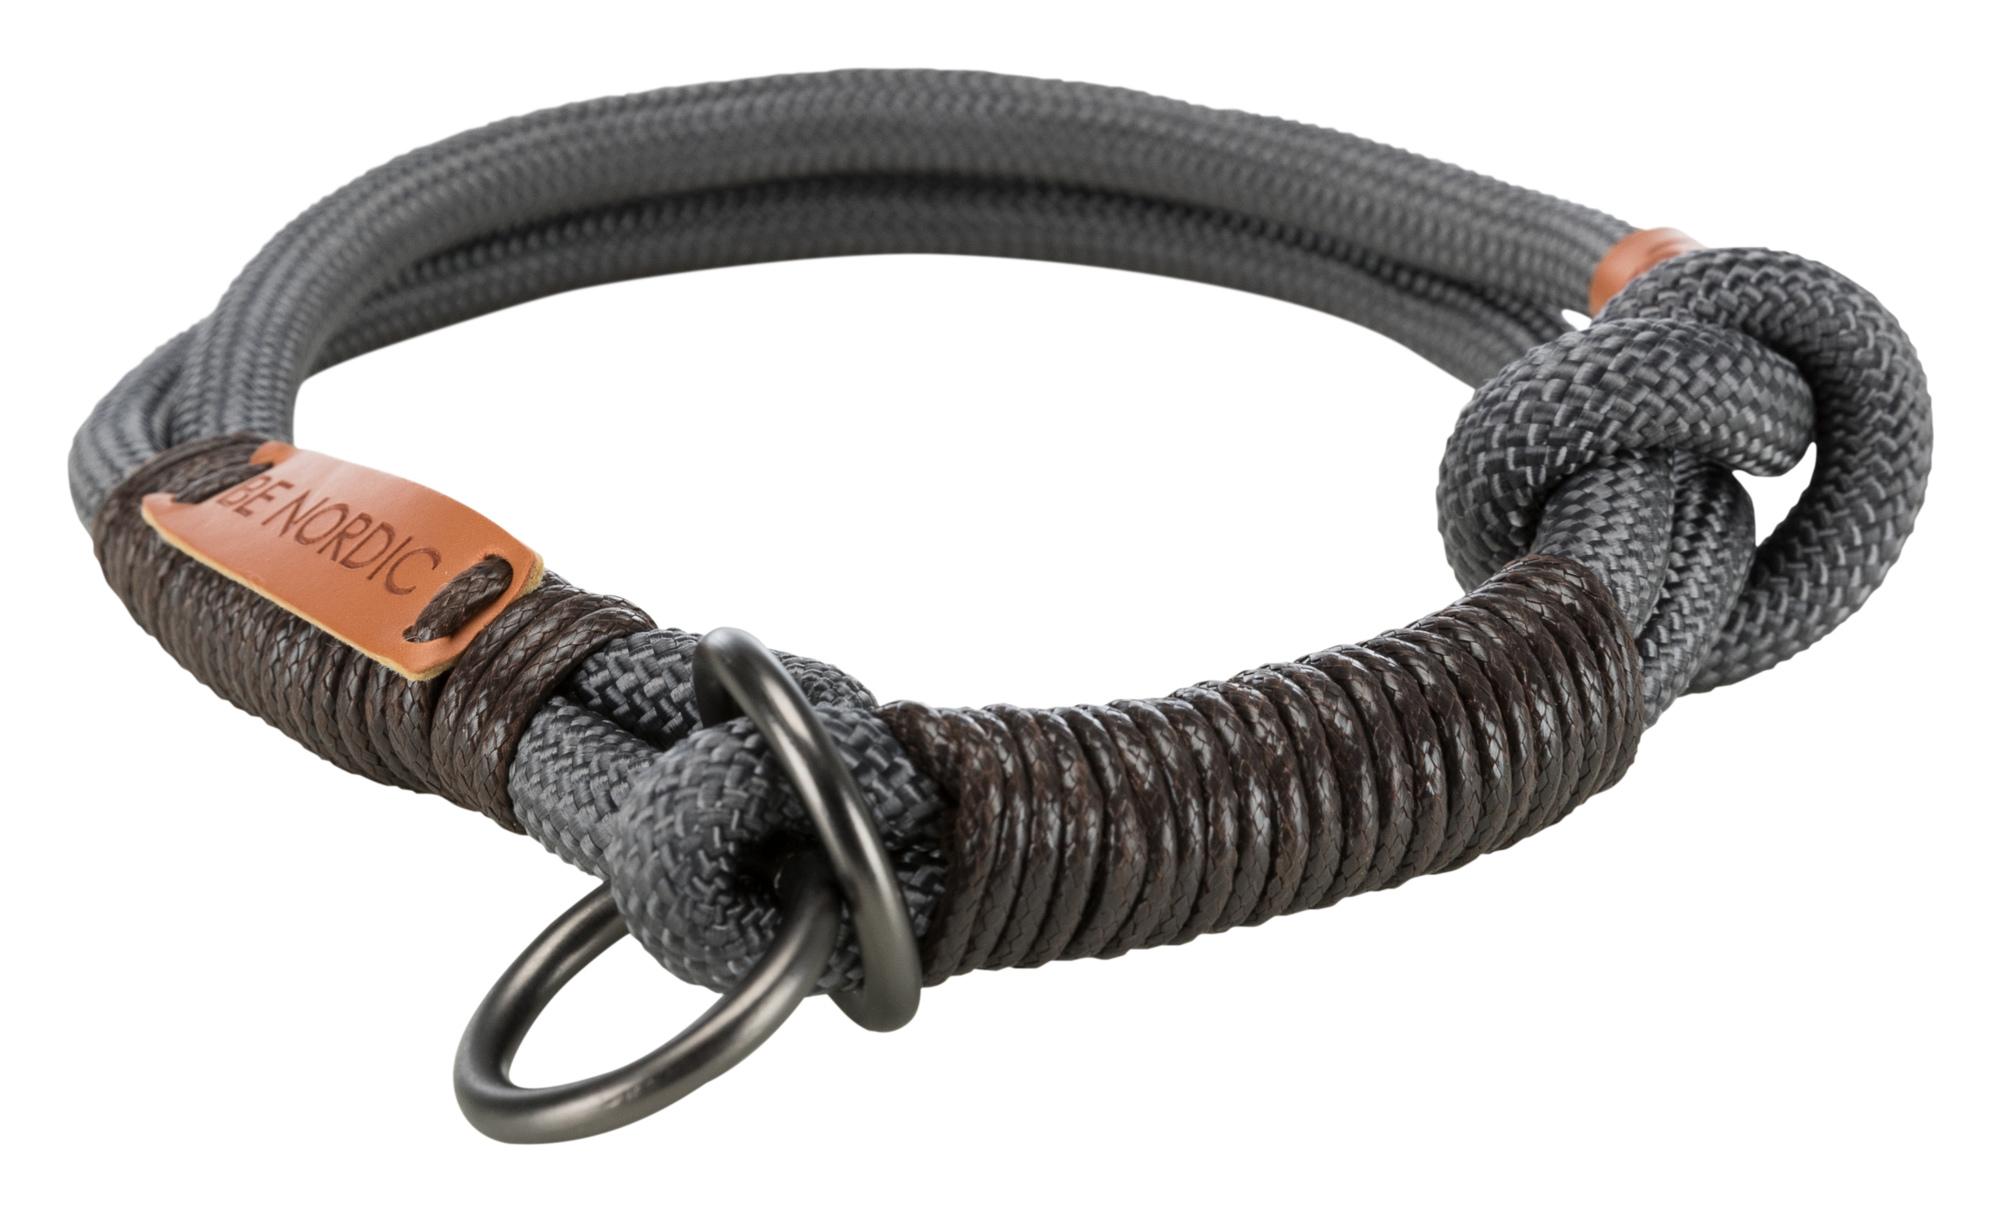 TRIXIE BE NORDIC Zug-Stopp-Halsband TRIXIE BE NORDIC Zug-Stopp-Halsband, S–M: 40 cm/ø 8 mm, dunkelgrau/braun